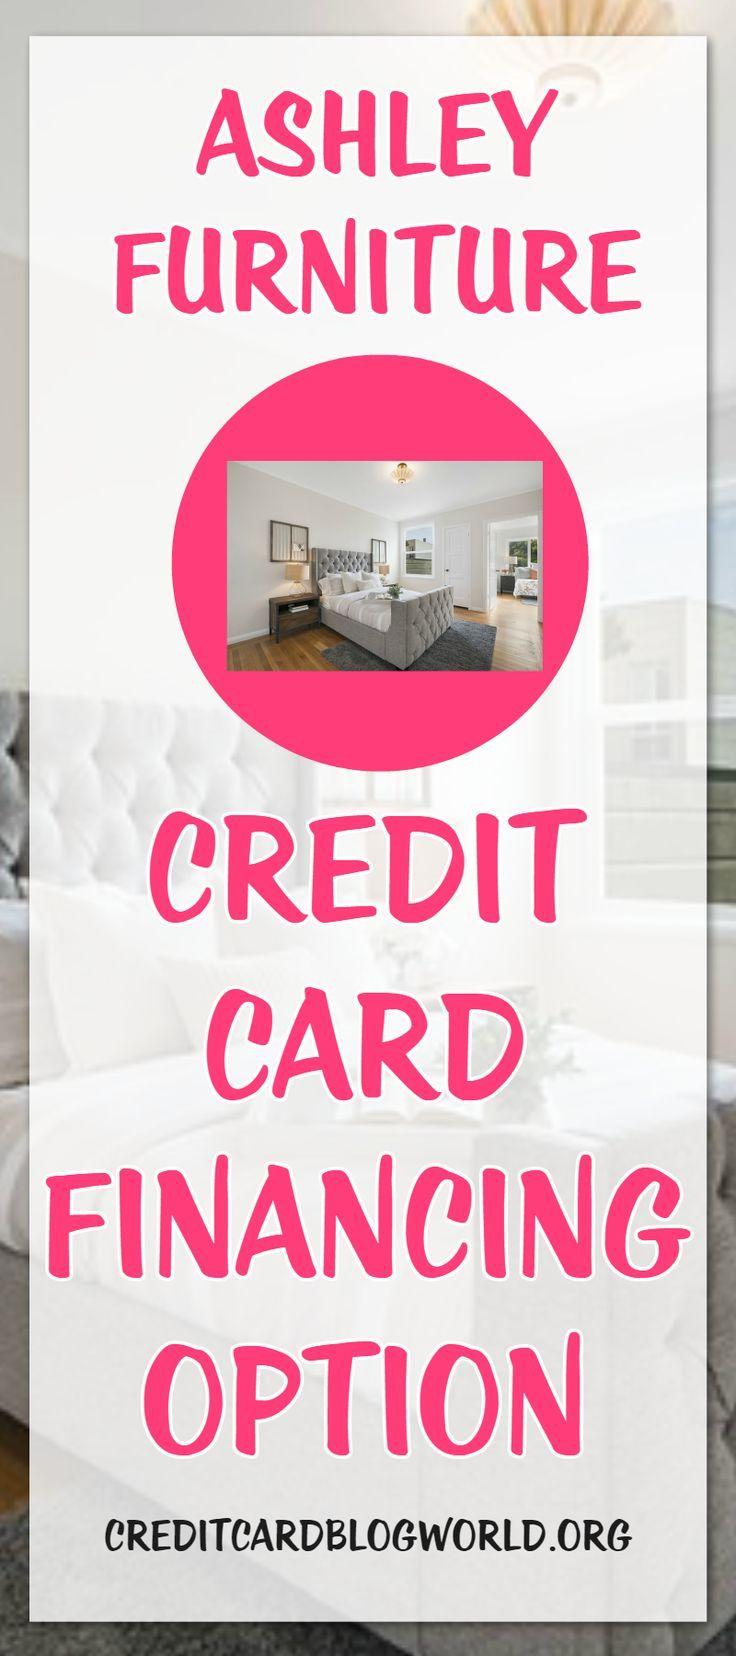 Ashley Furniture Credit Card Financing Option. Ashley Furniture Credit Card peop…